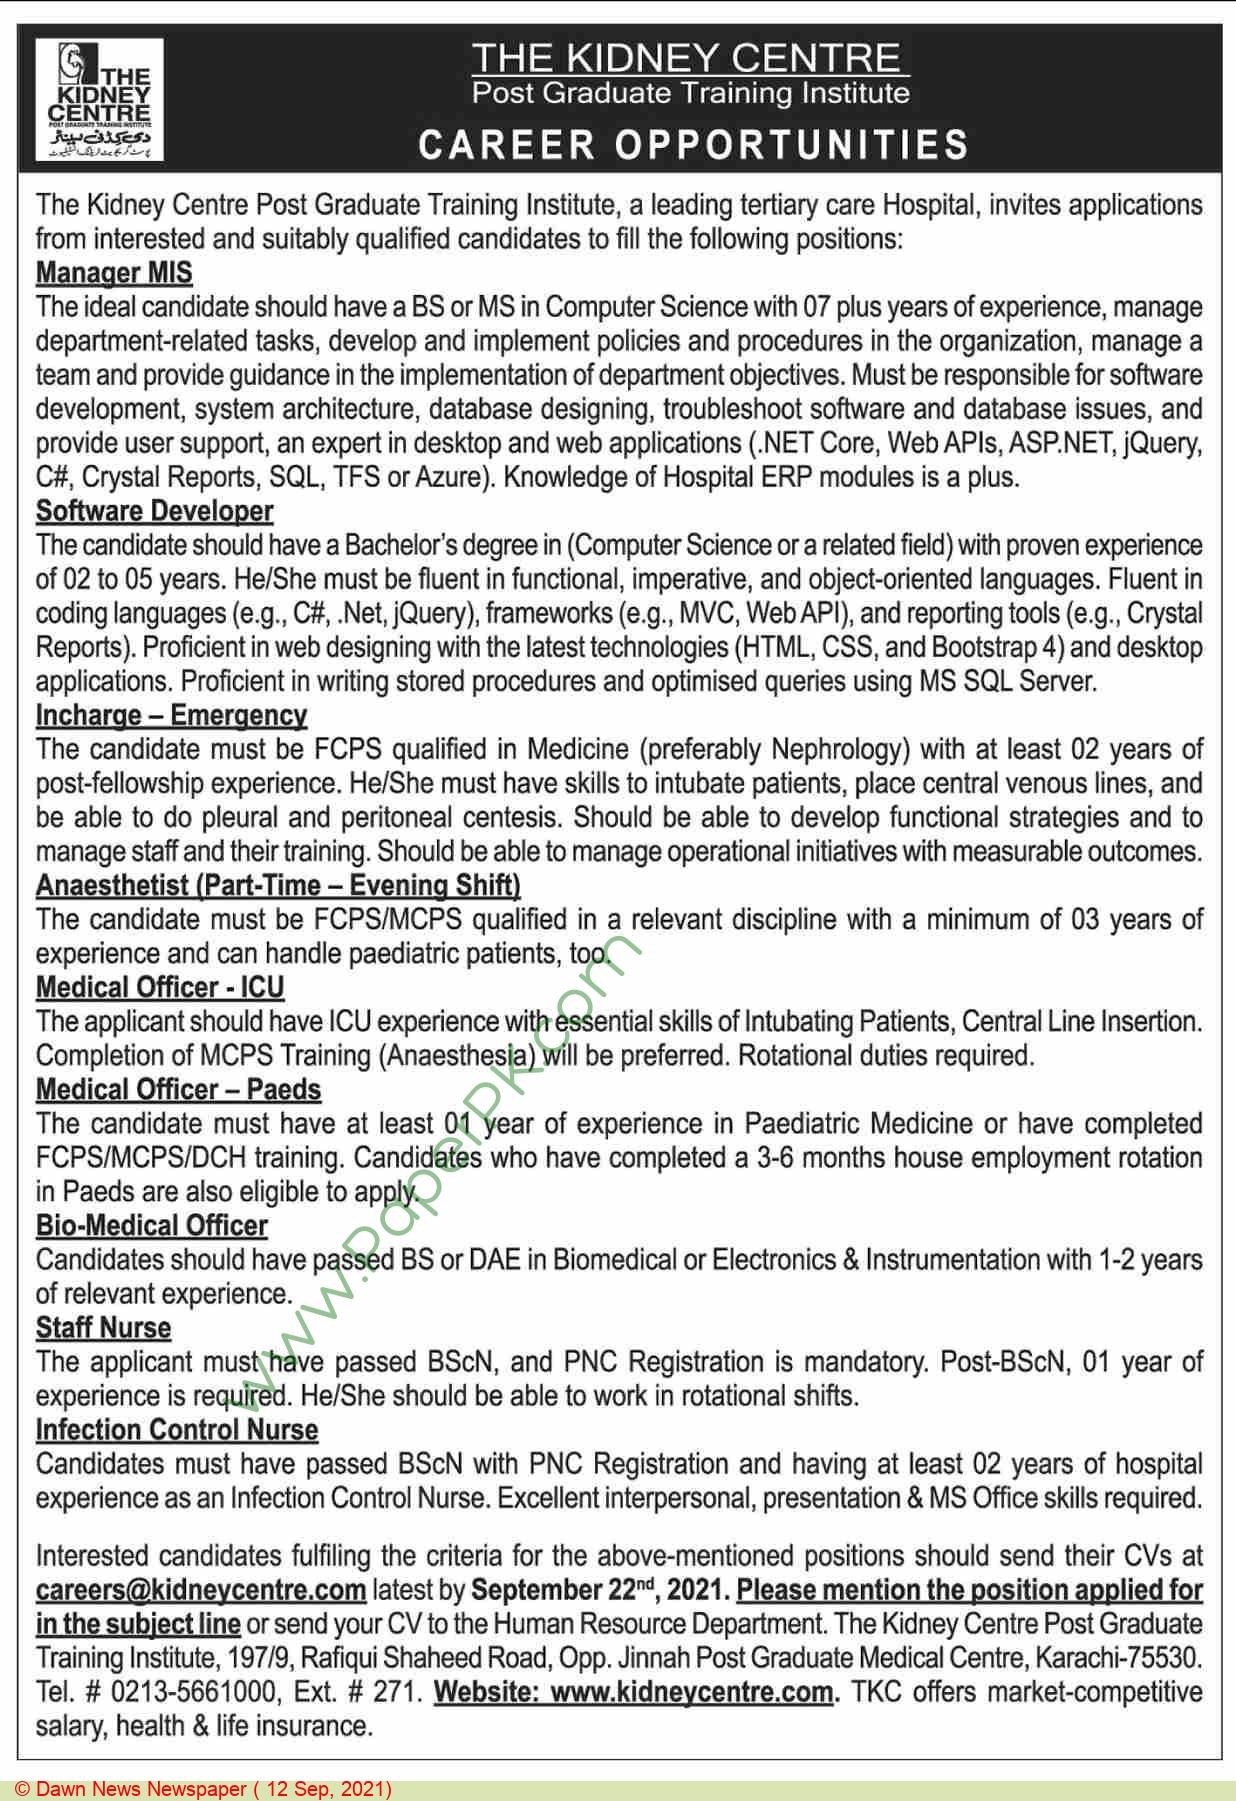 The Kidney Centre Postgraduate Training Institute jobs newspaper ad for Staff Nurse in Karachi on 2021-09-12